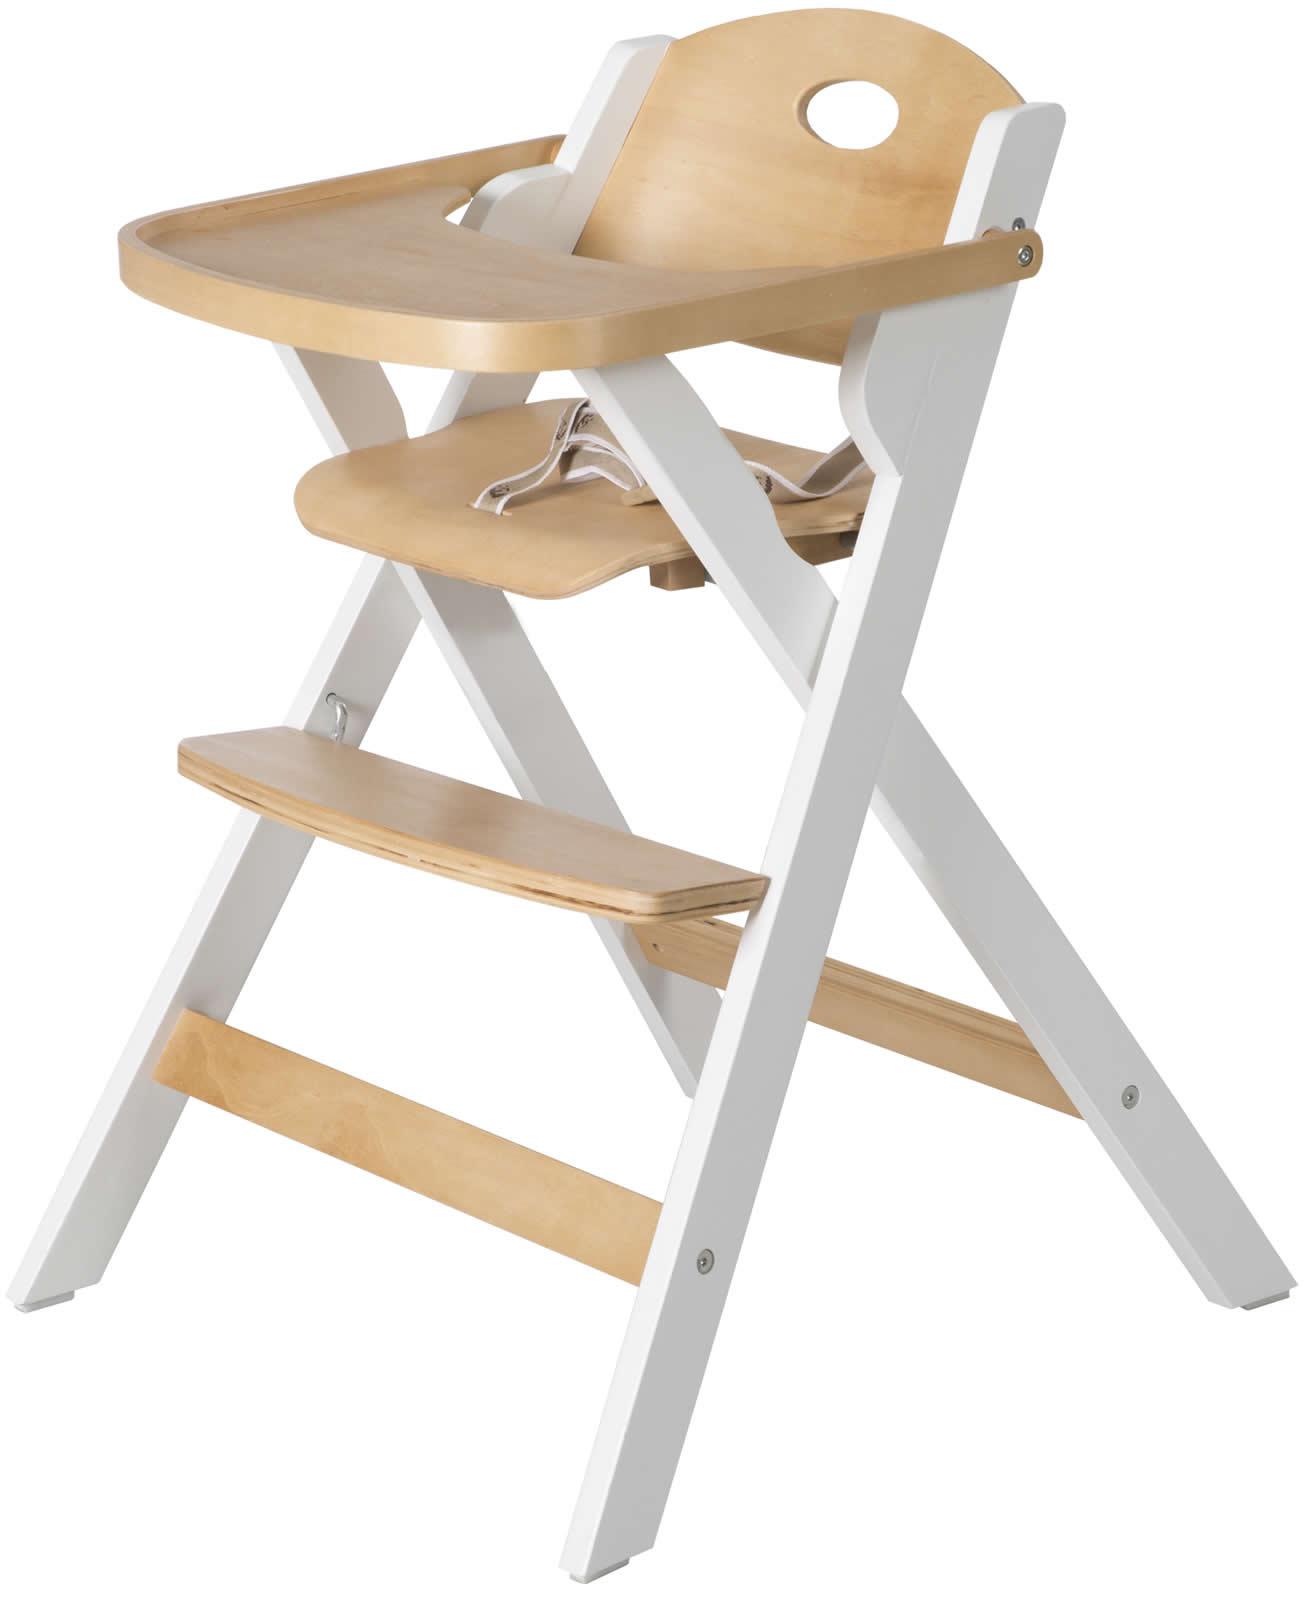 roba klapphochstuhl hochstuhl kinderhochstuhl holz ebay. Black Bedroom Furniture Sets. Home Design Ideas